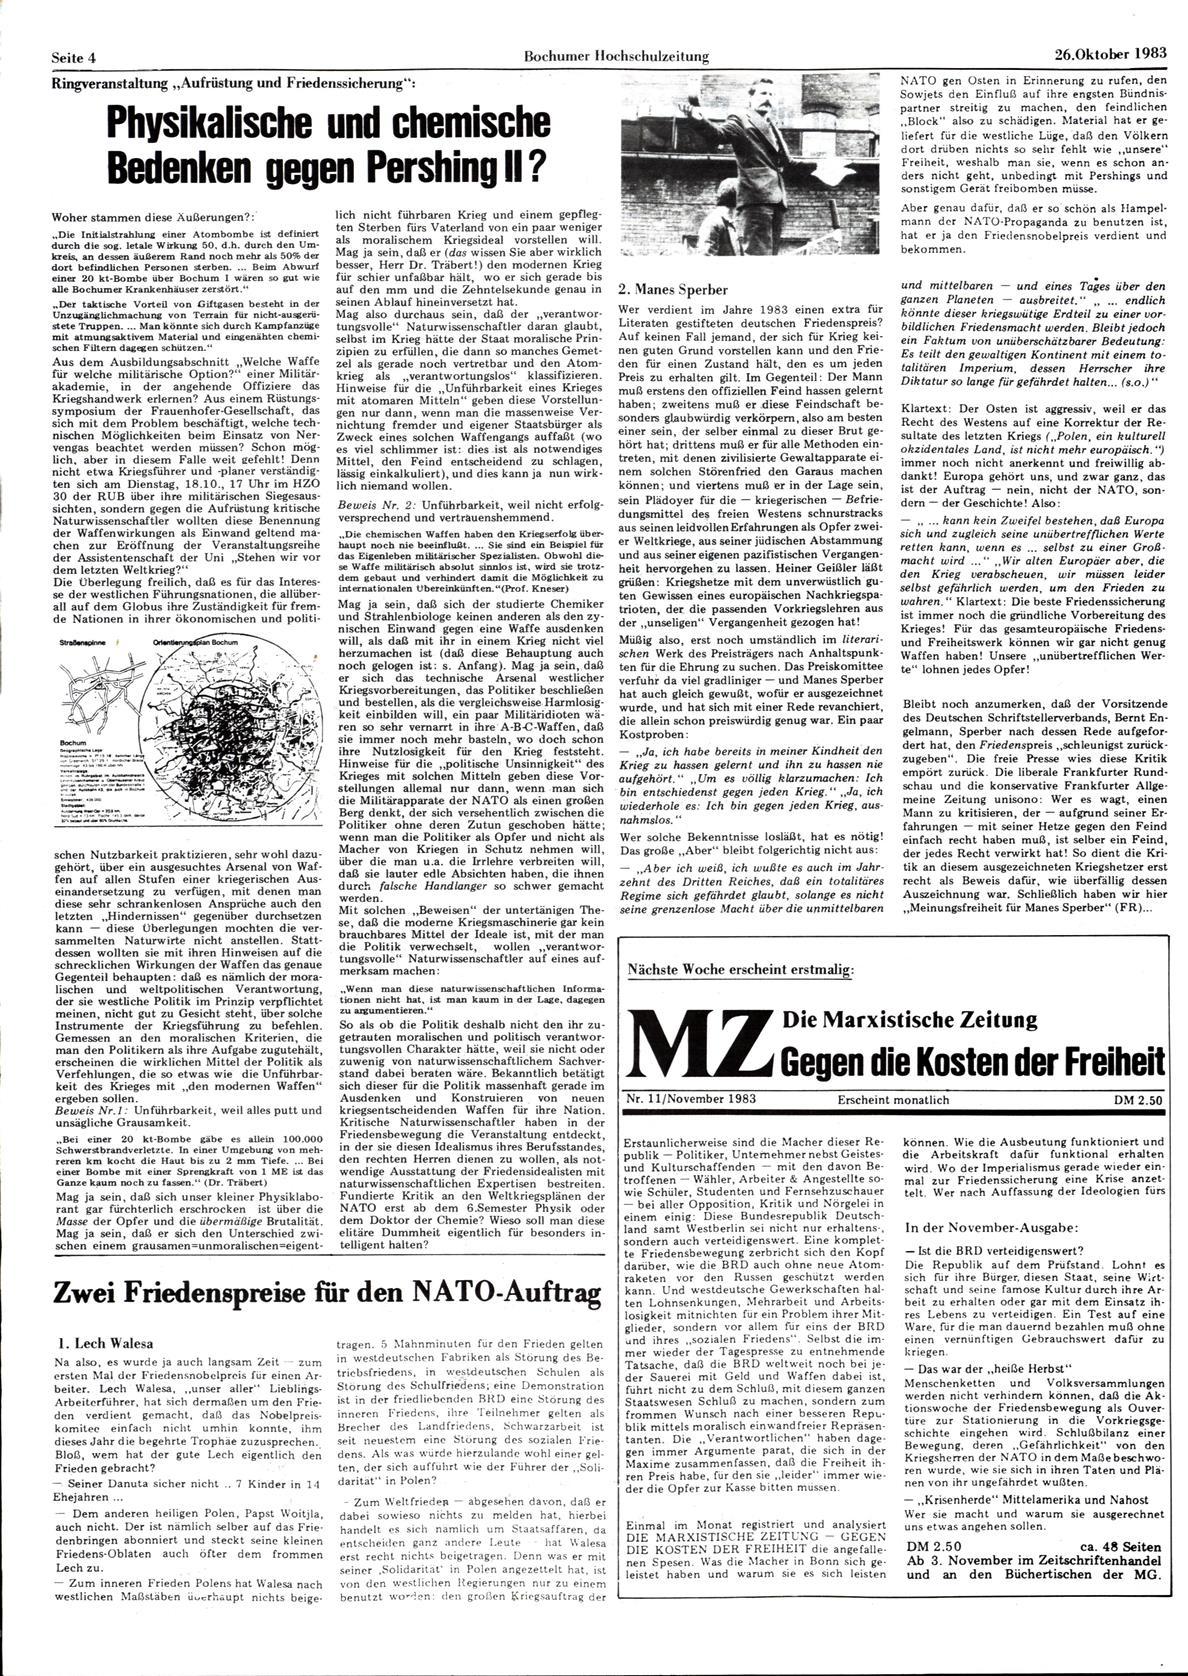 Bochum_BHZ_19831026_078_004